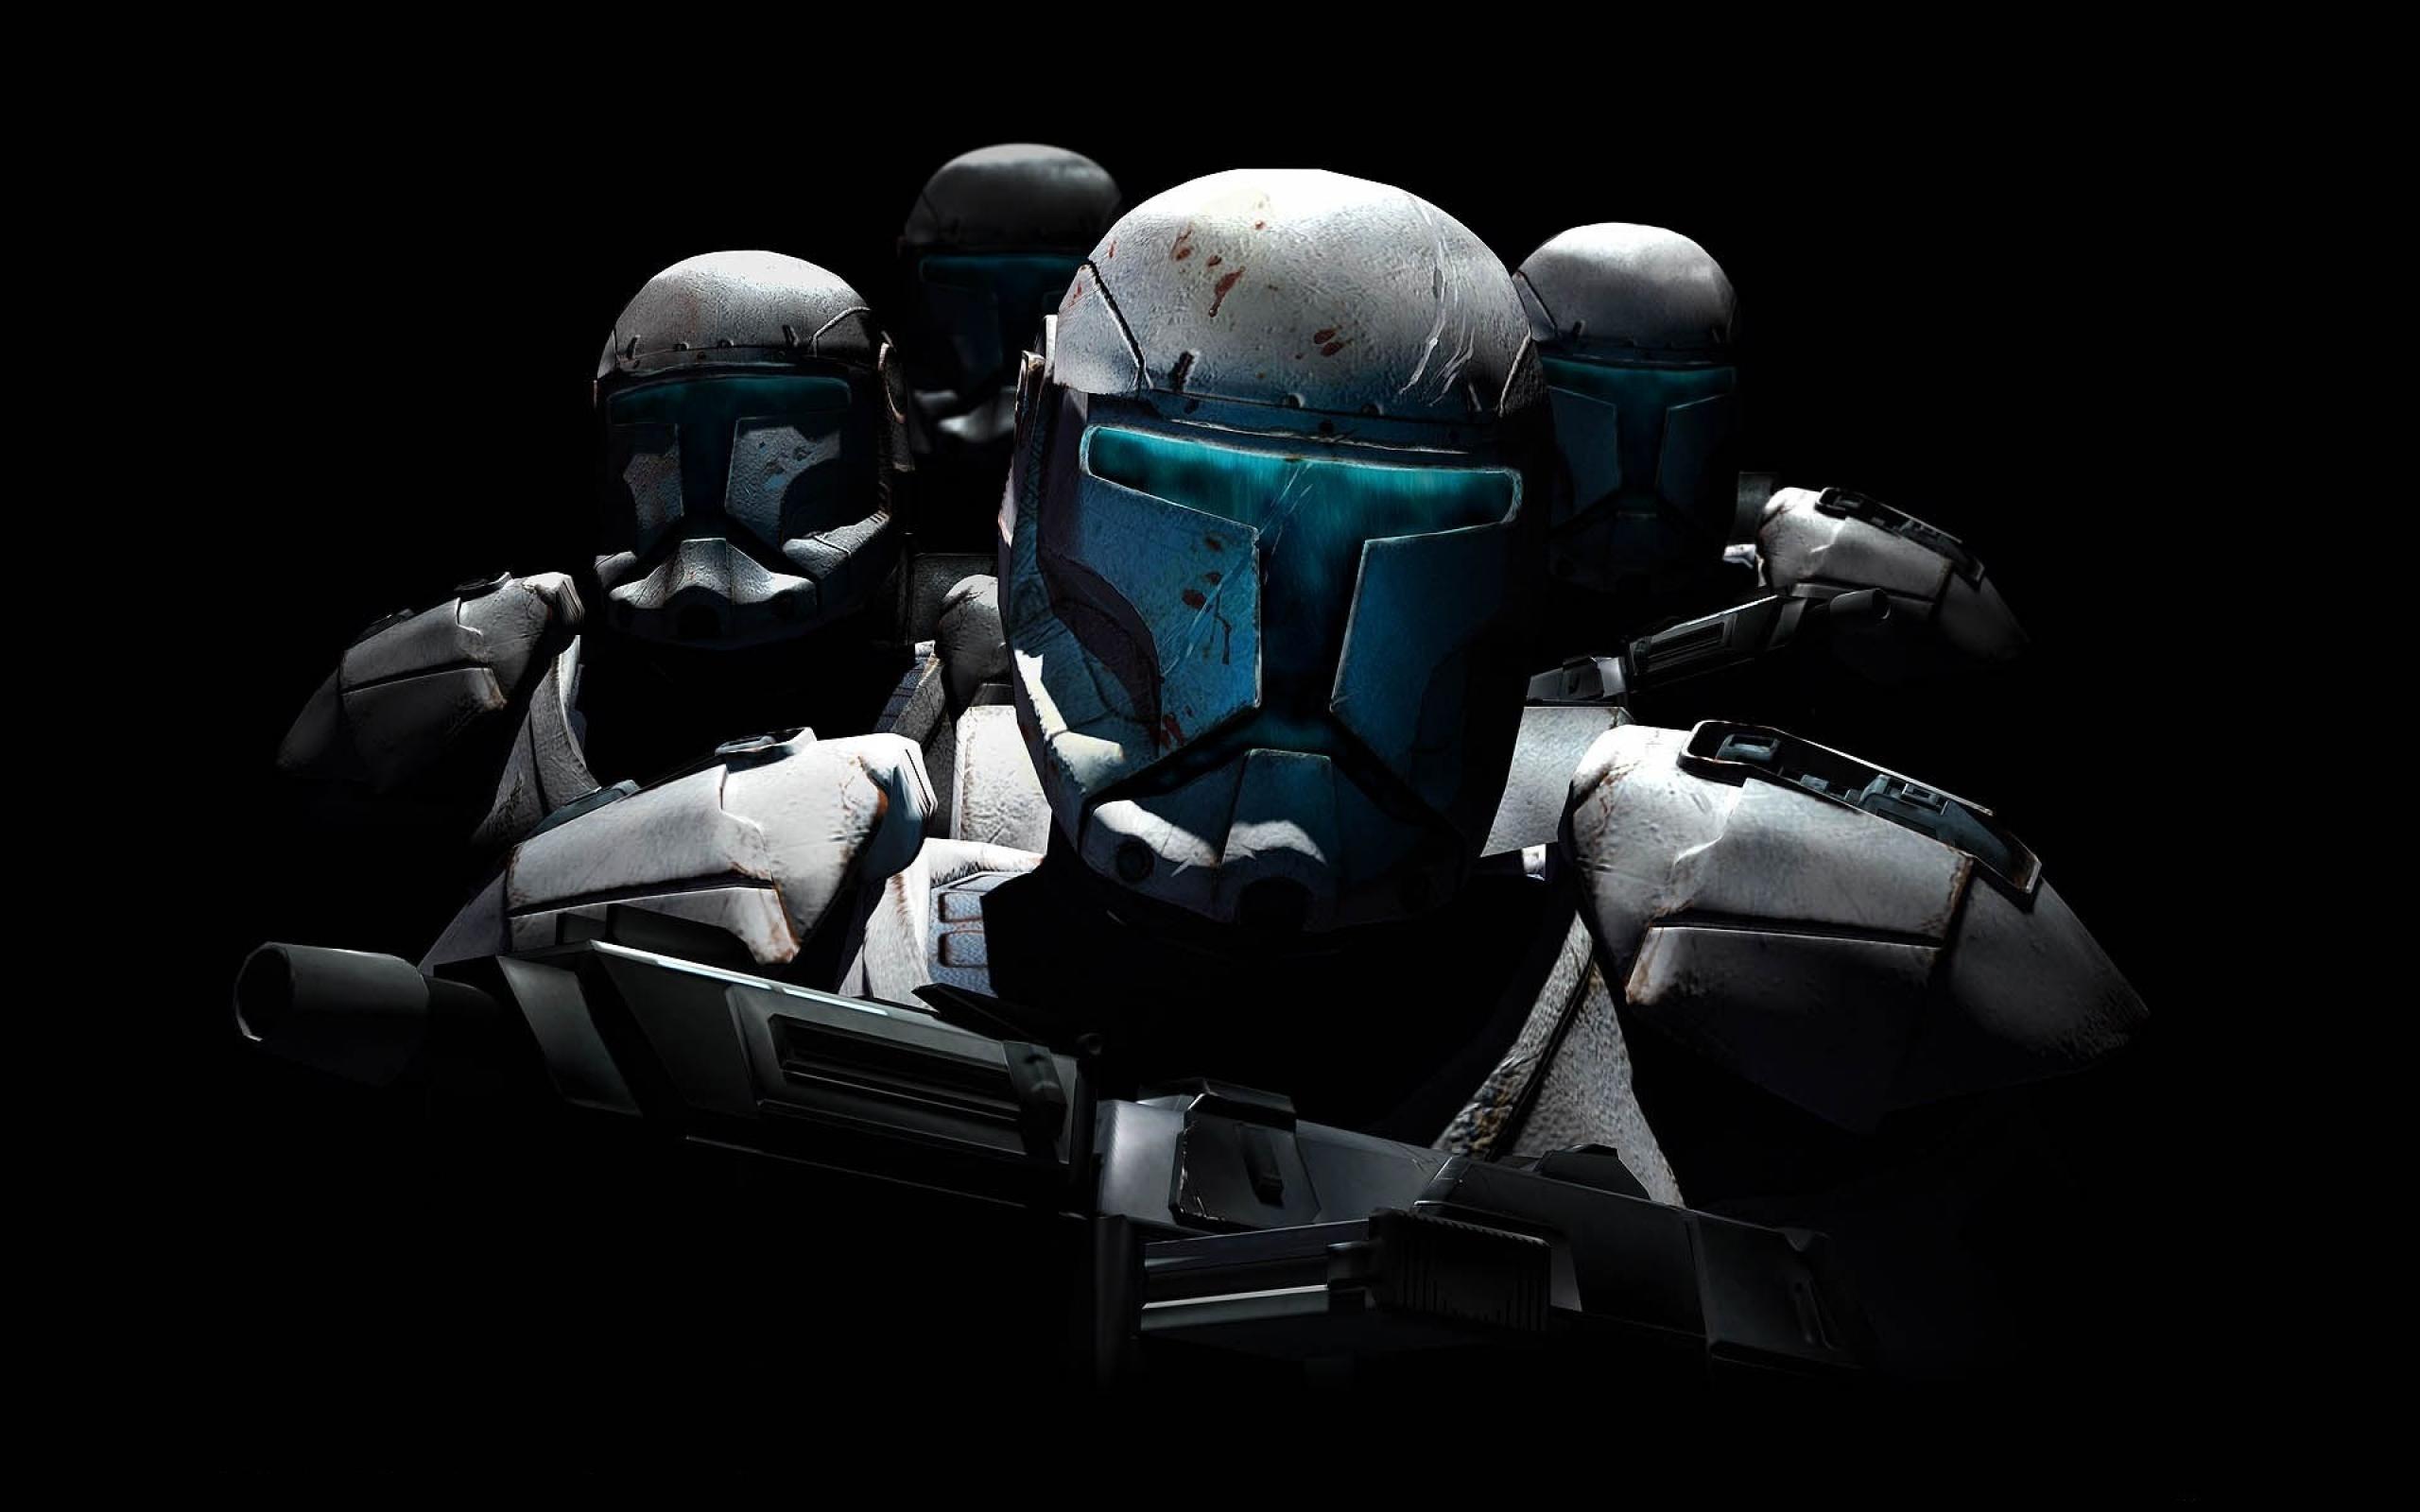 50 Star Wars Wallpapers 2560x1600 On Wallpapersafari